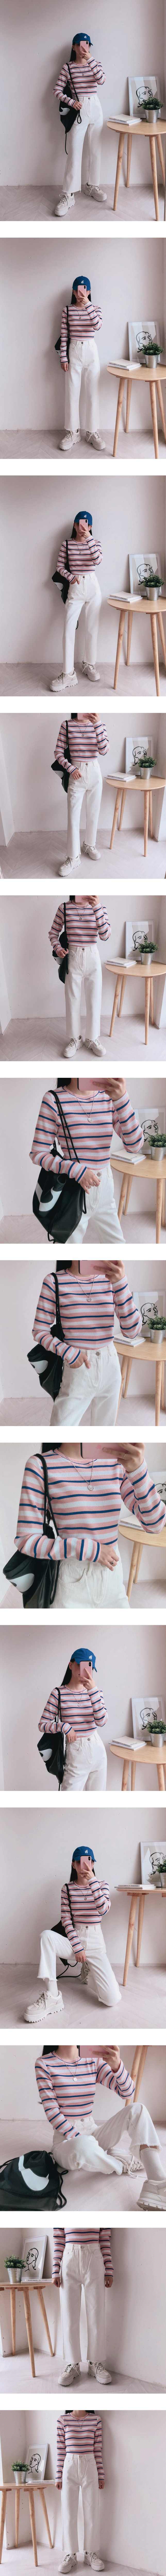 Arow striped T-shirt